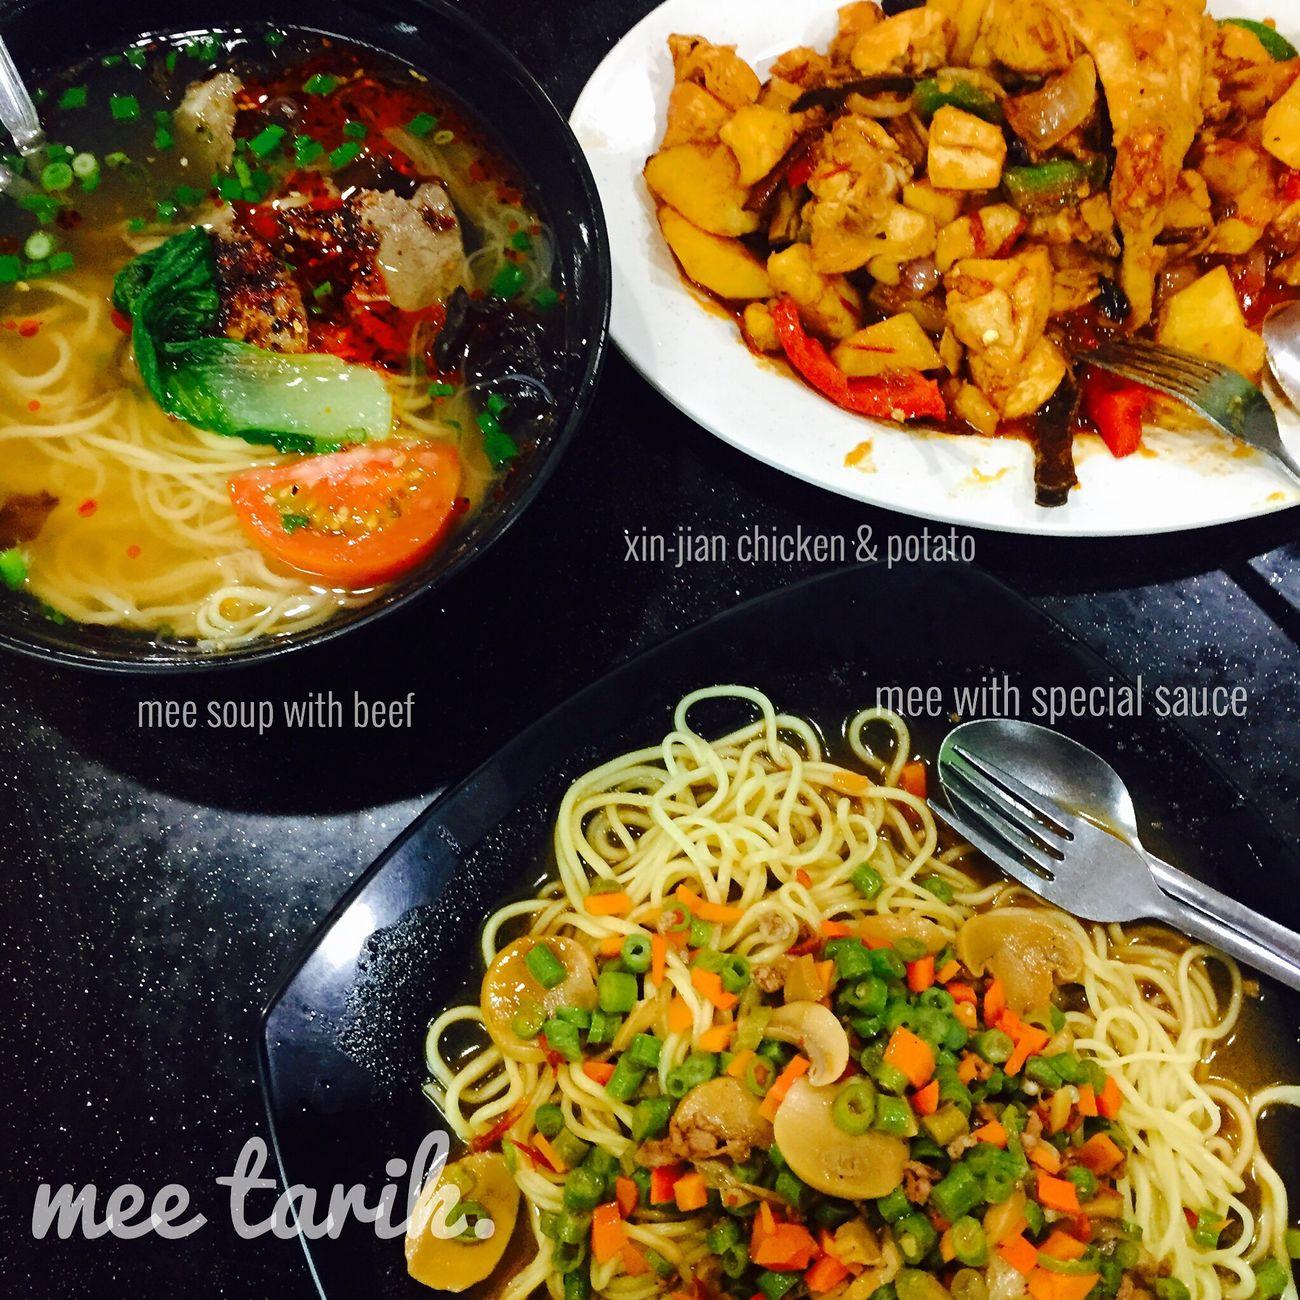 dinner! heavy dinner😤😤 Dinnertime What's For Dinner? EyeEm Best Shots EyeEm Best Edits EyeEmBestPics EyeEmMalaysia EyeEm Gallery Iphonephotography IPhoneography Noodles